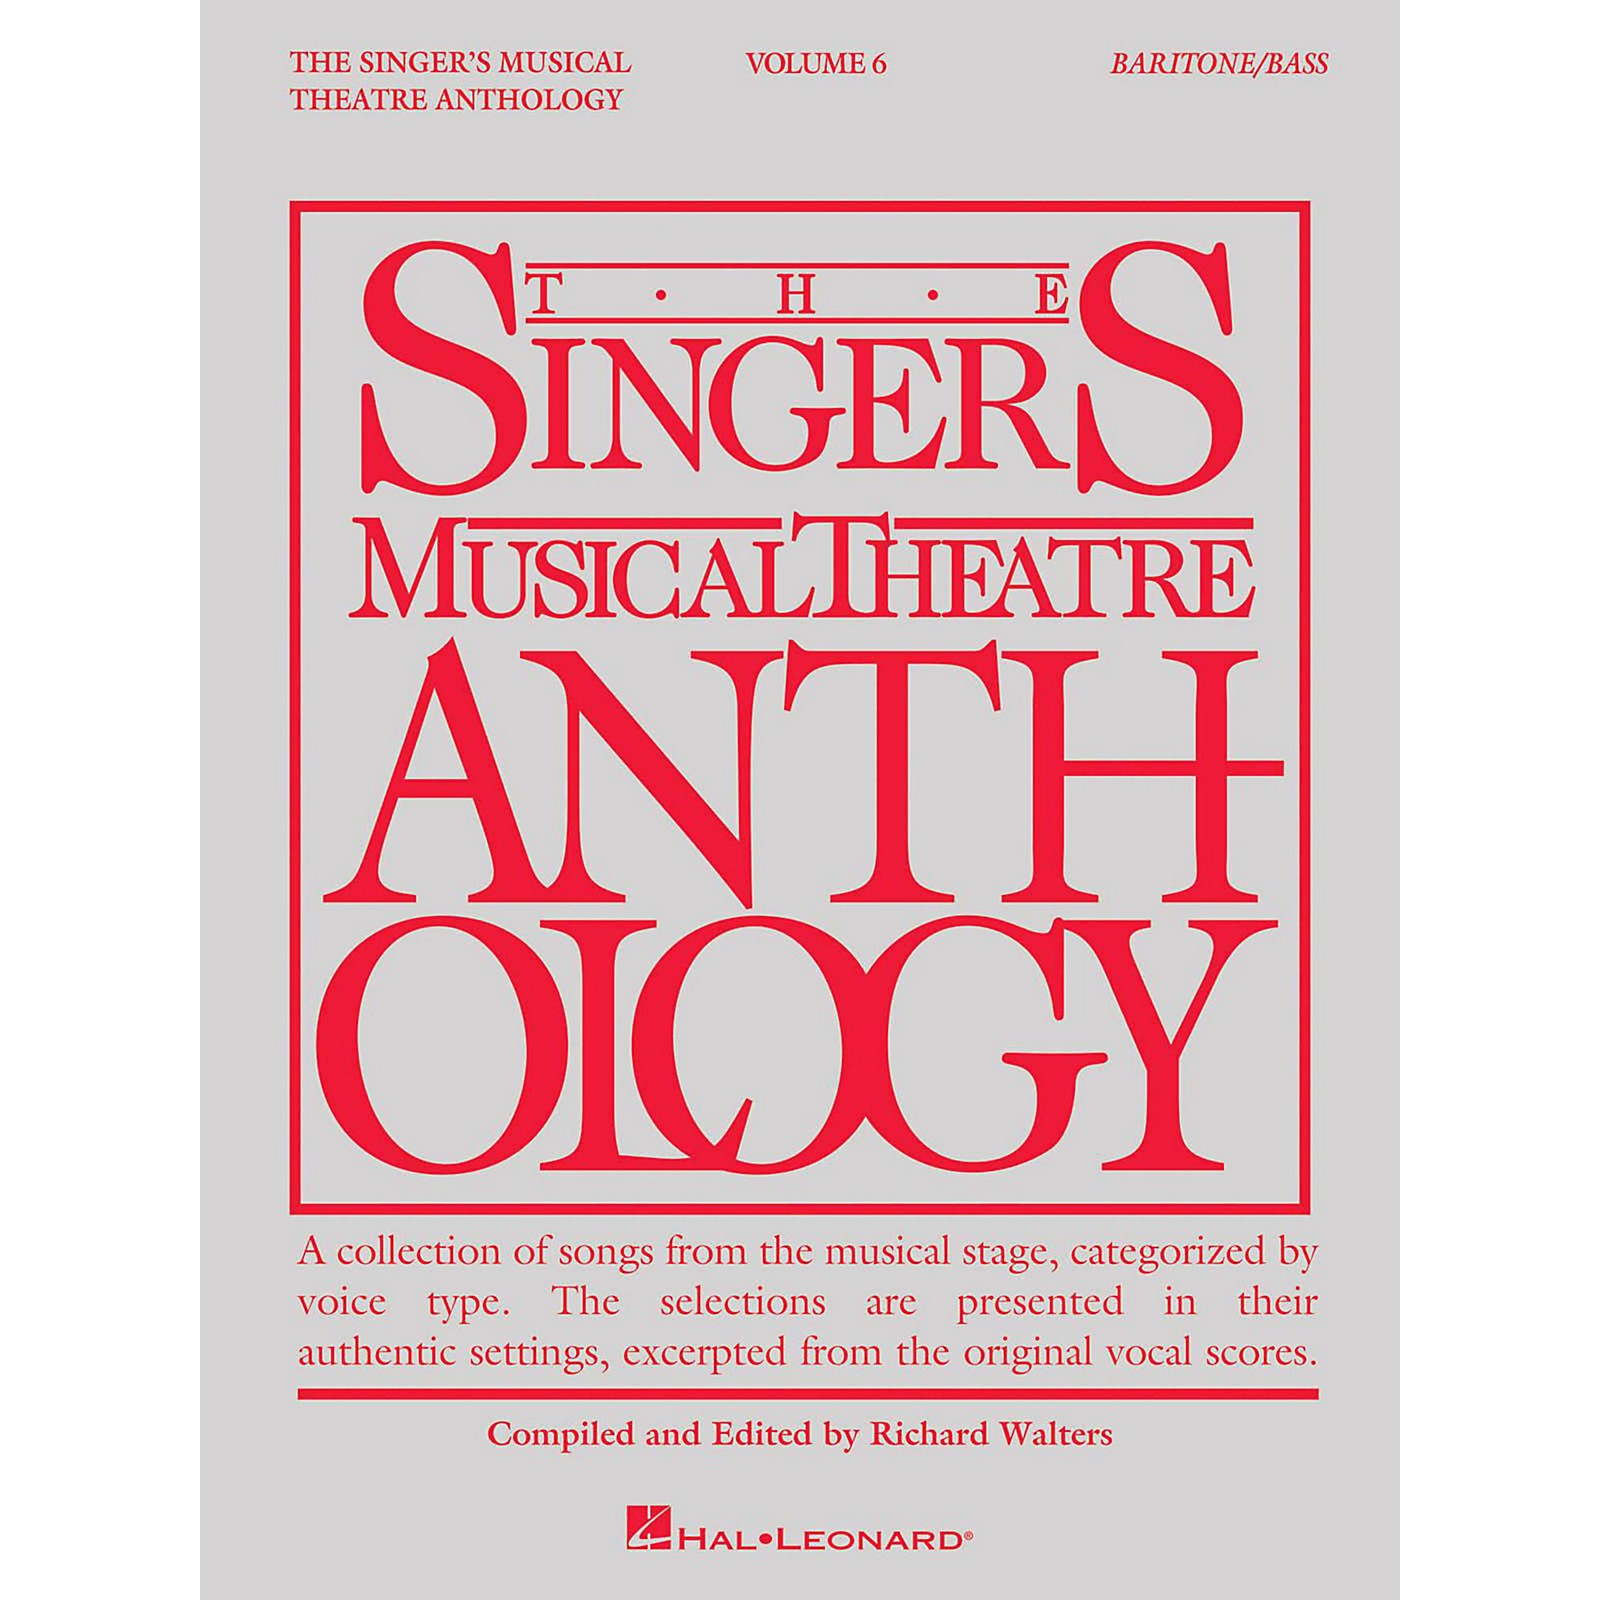 Hal Leonard The Singer's Musical Theatre Anthology: Baritone/Bass - Volume 6